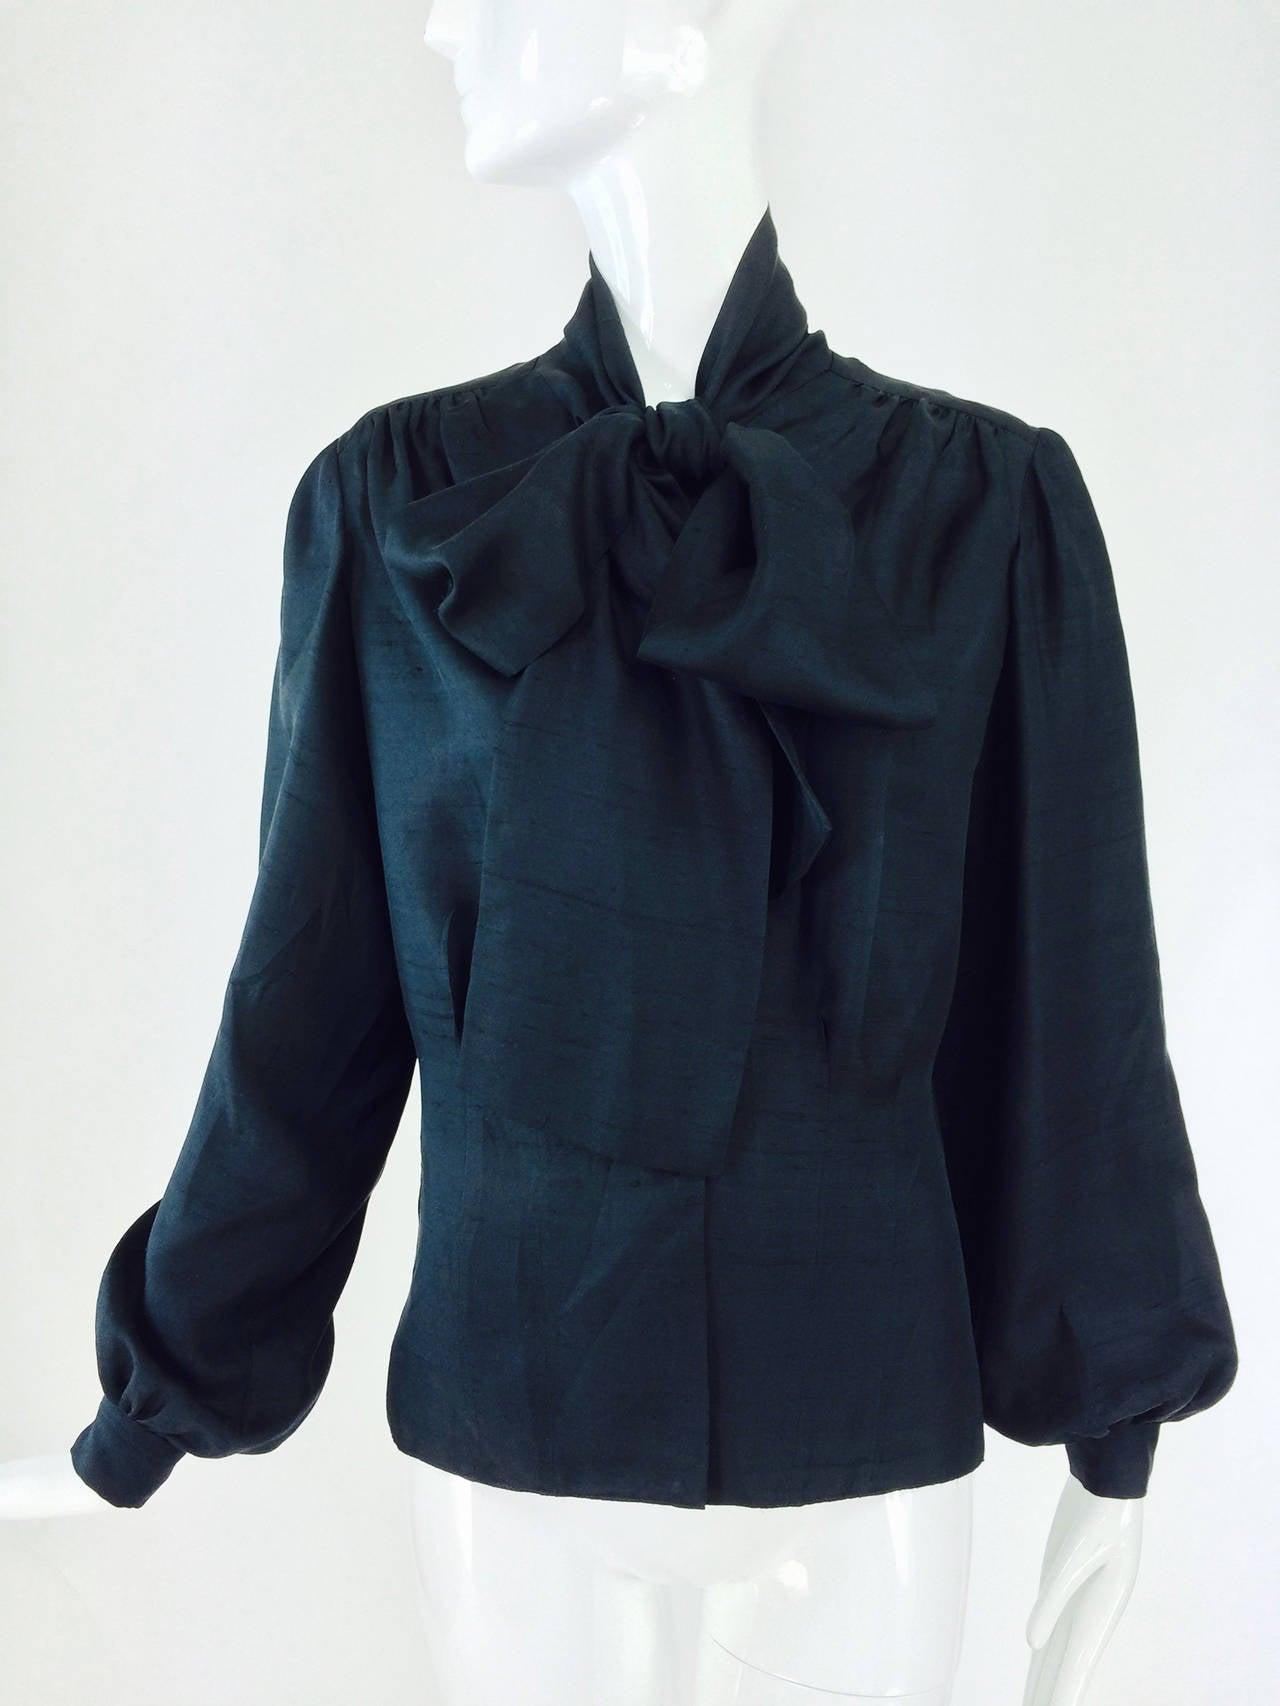 Pierre balmain haute couture black pongee silk bow tie for Haute couture shirts